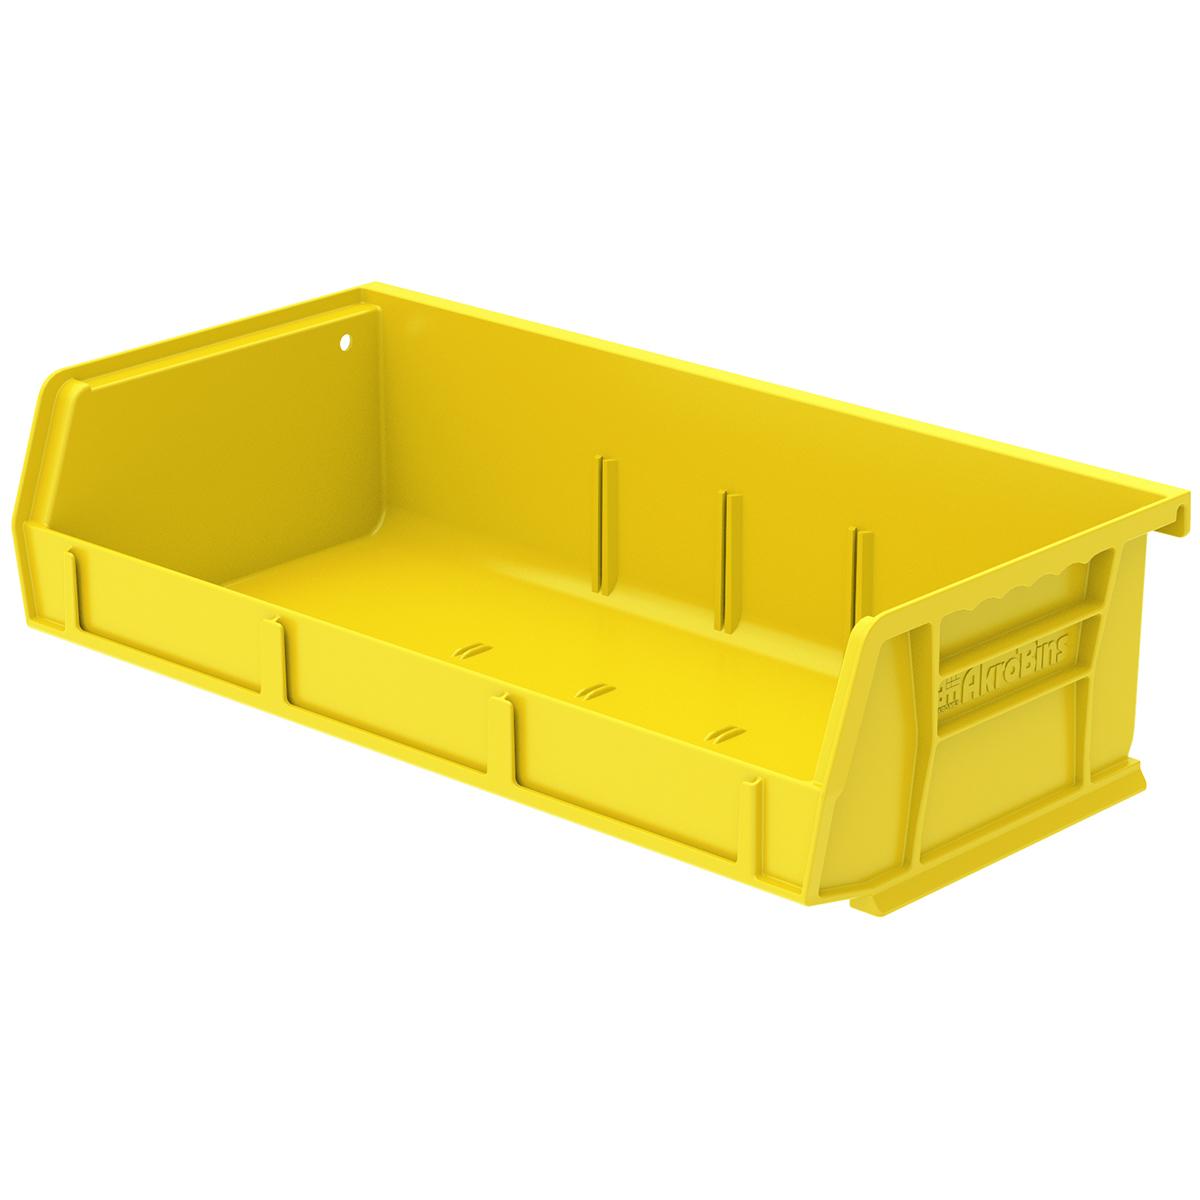 Akro Mils Akrobins Plastic Storage Bins Stackable